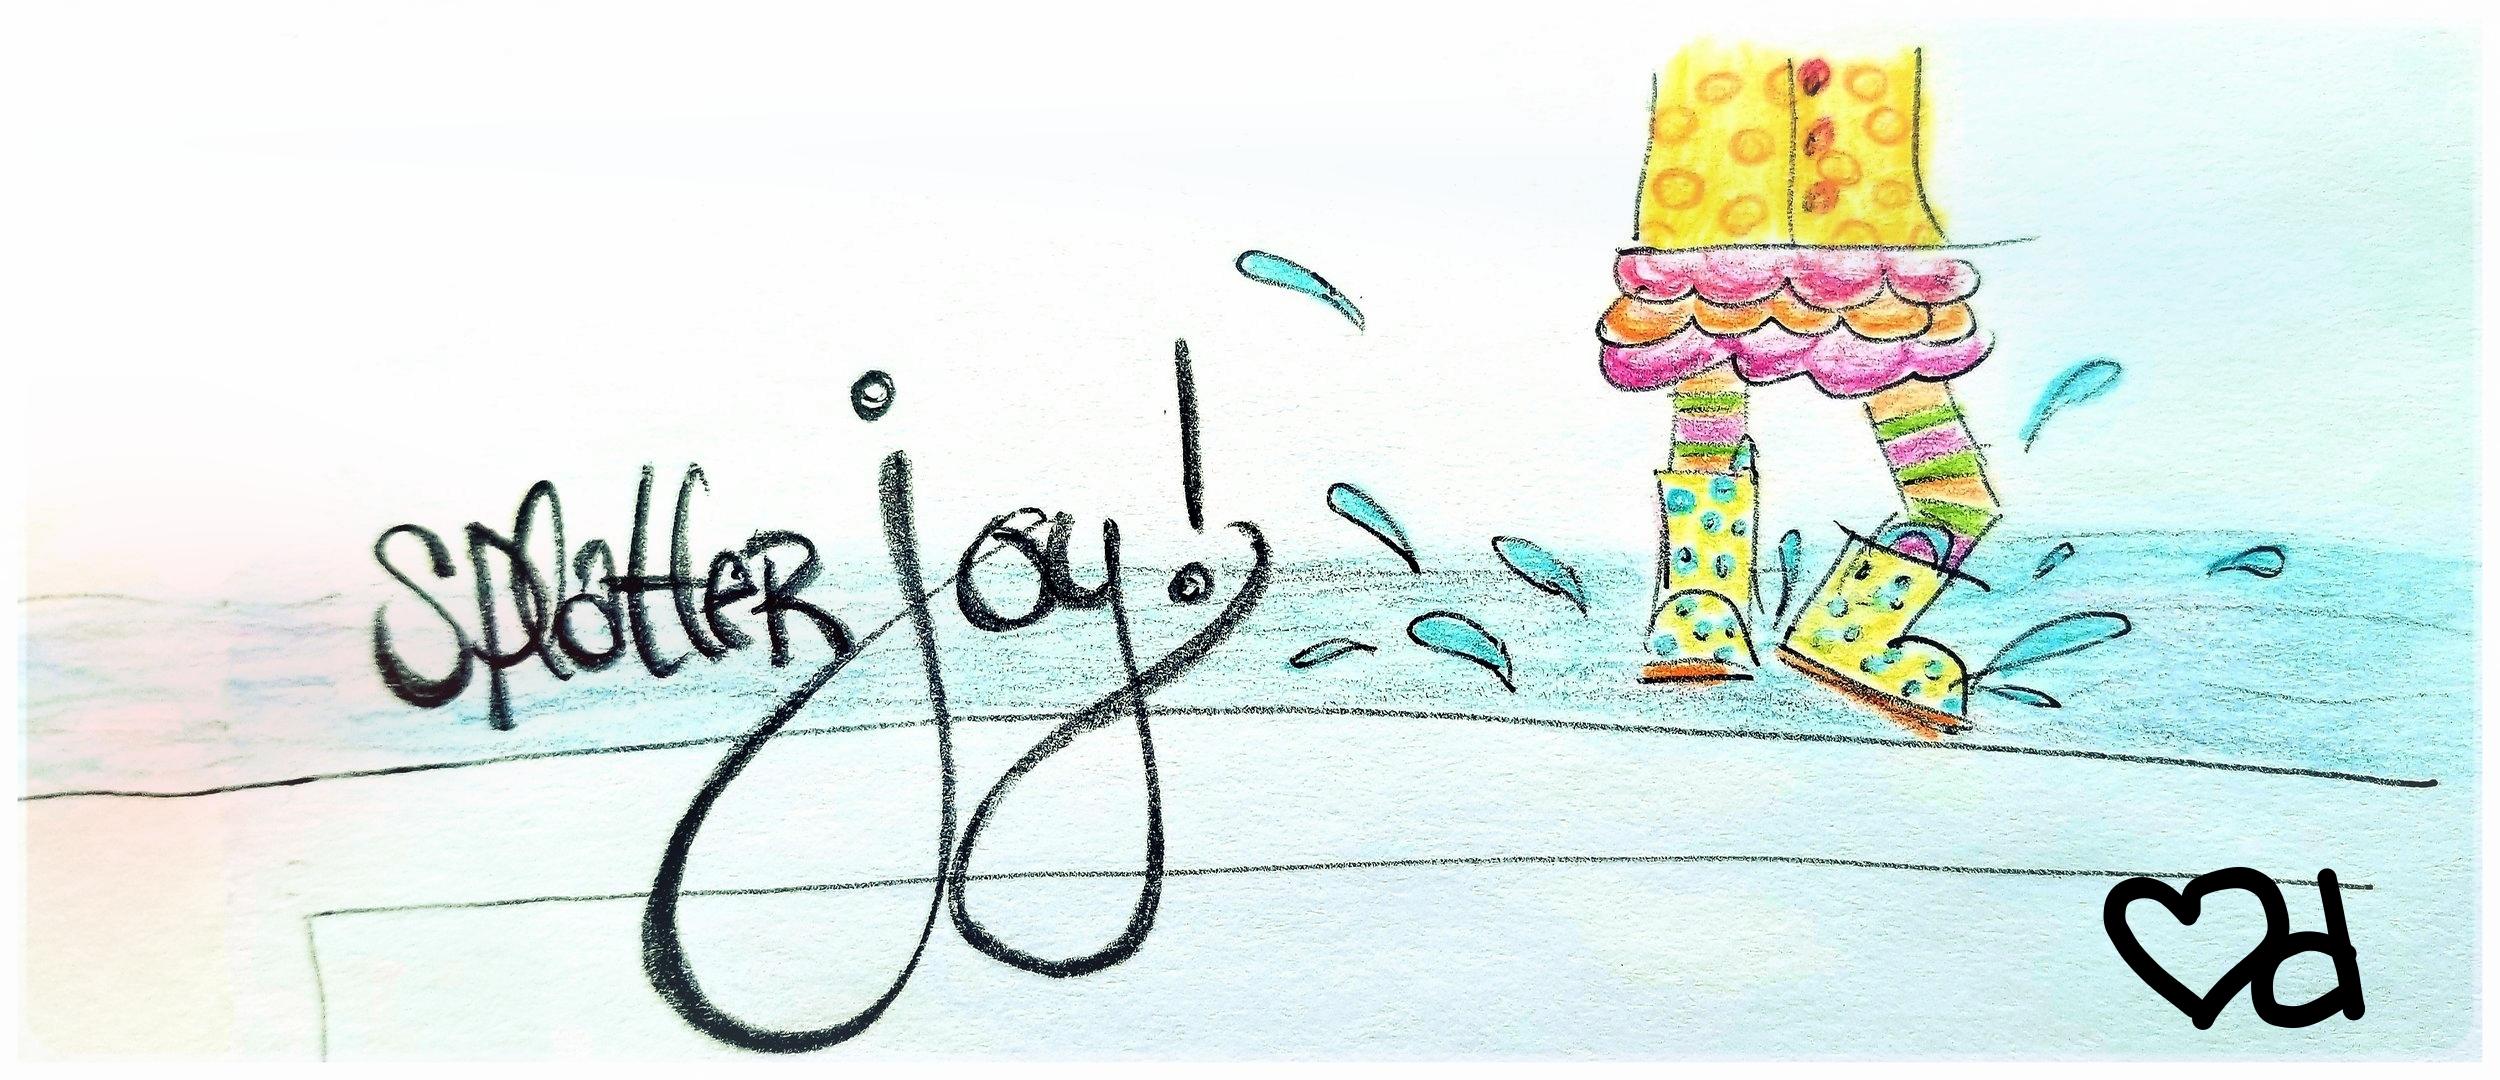 splatter joy happy puddle logo (2).jpg